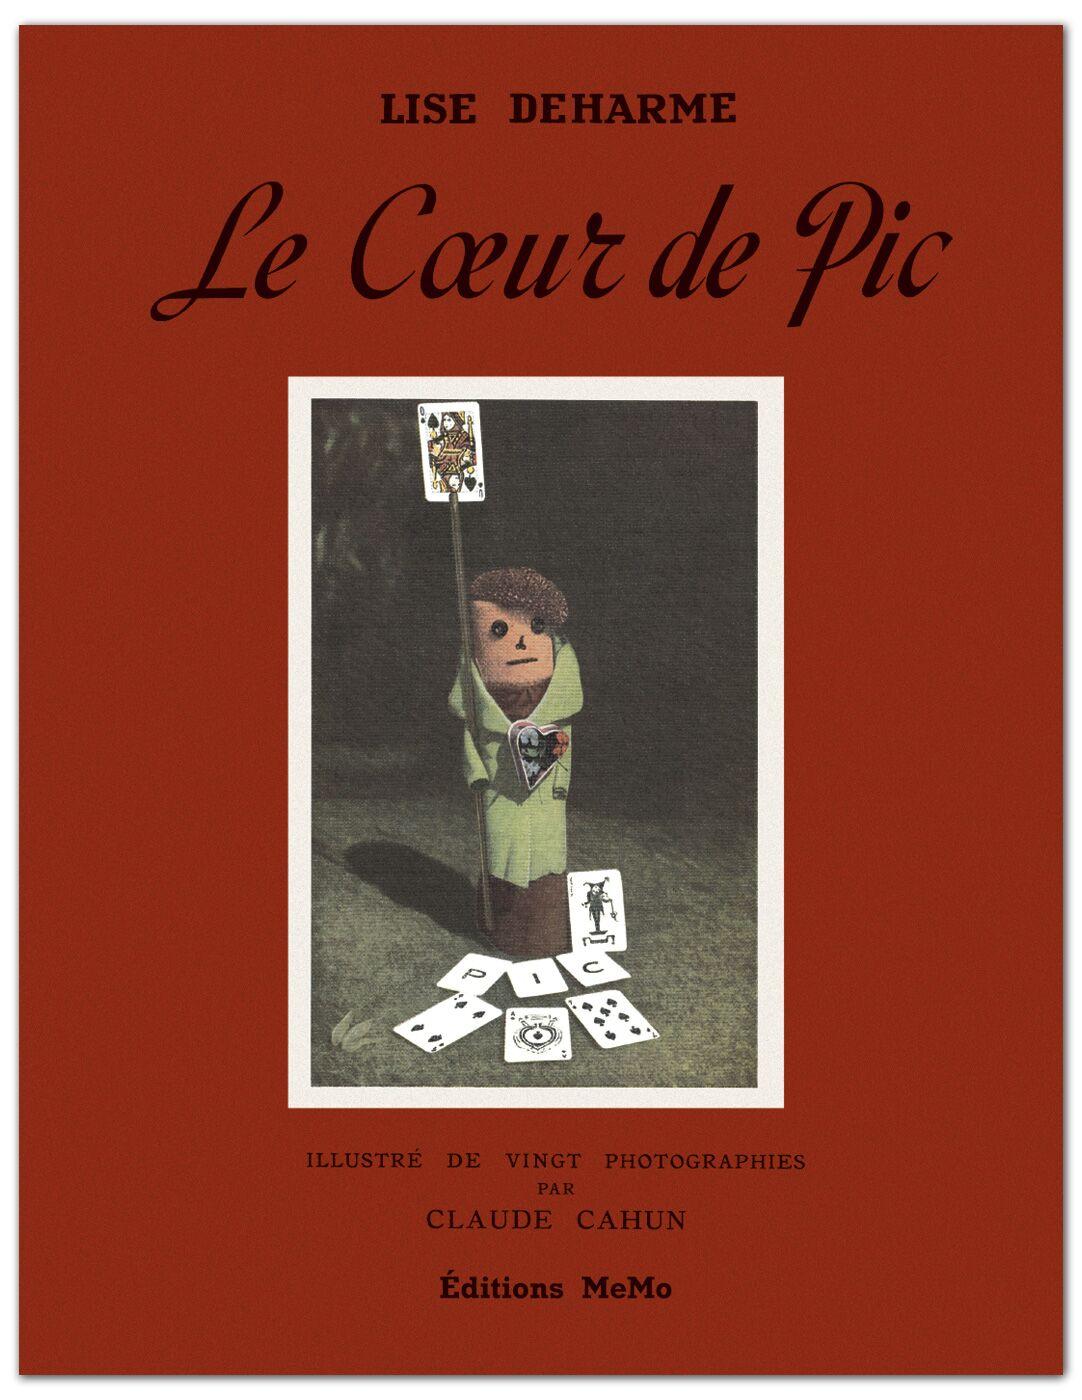 Lise Deharme, <br /><em>LeCœur dePic</em>, 1937